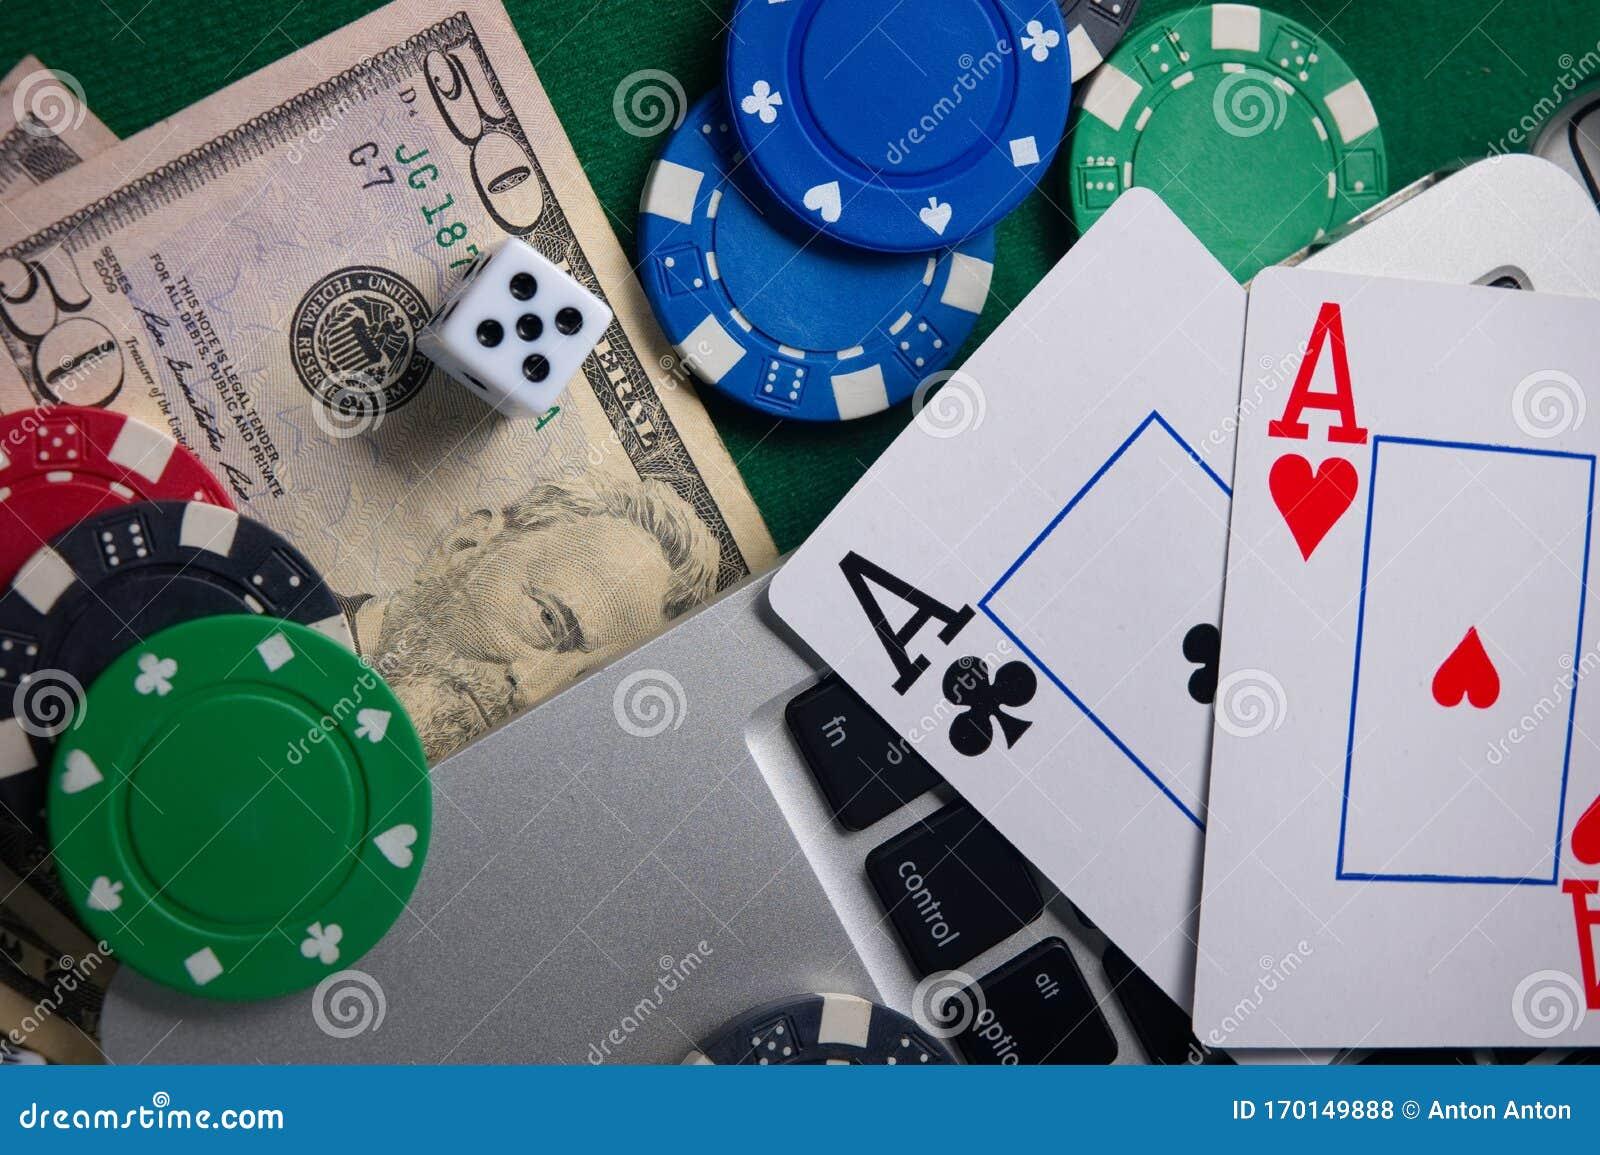 Online Casino Poker Background For Business Online Games Poker Blackjack Game Online Card Games Laptop Money